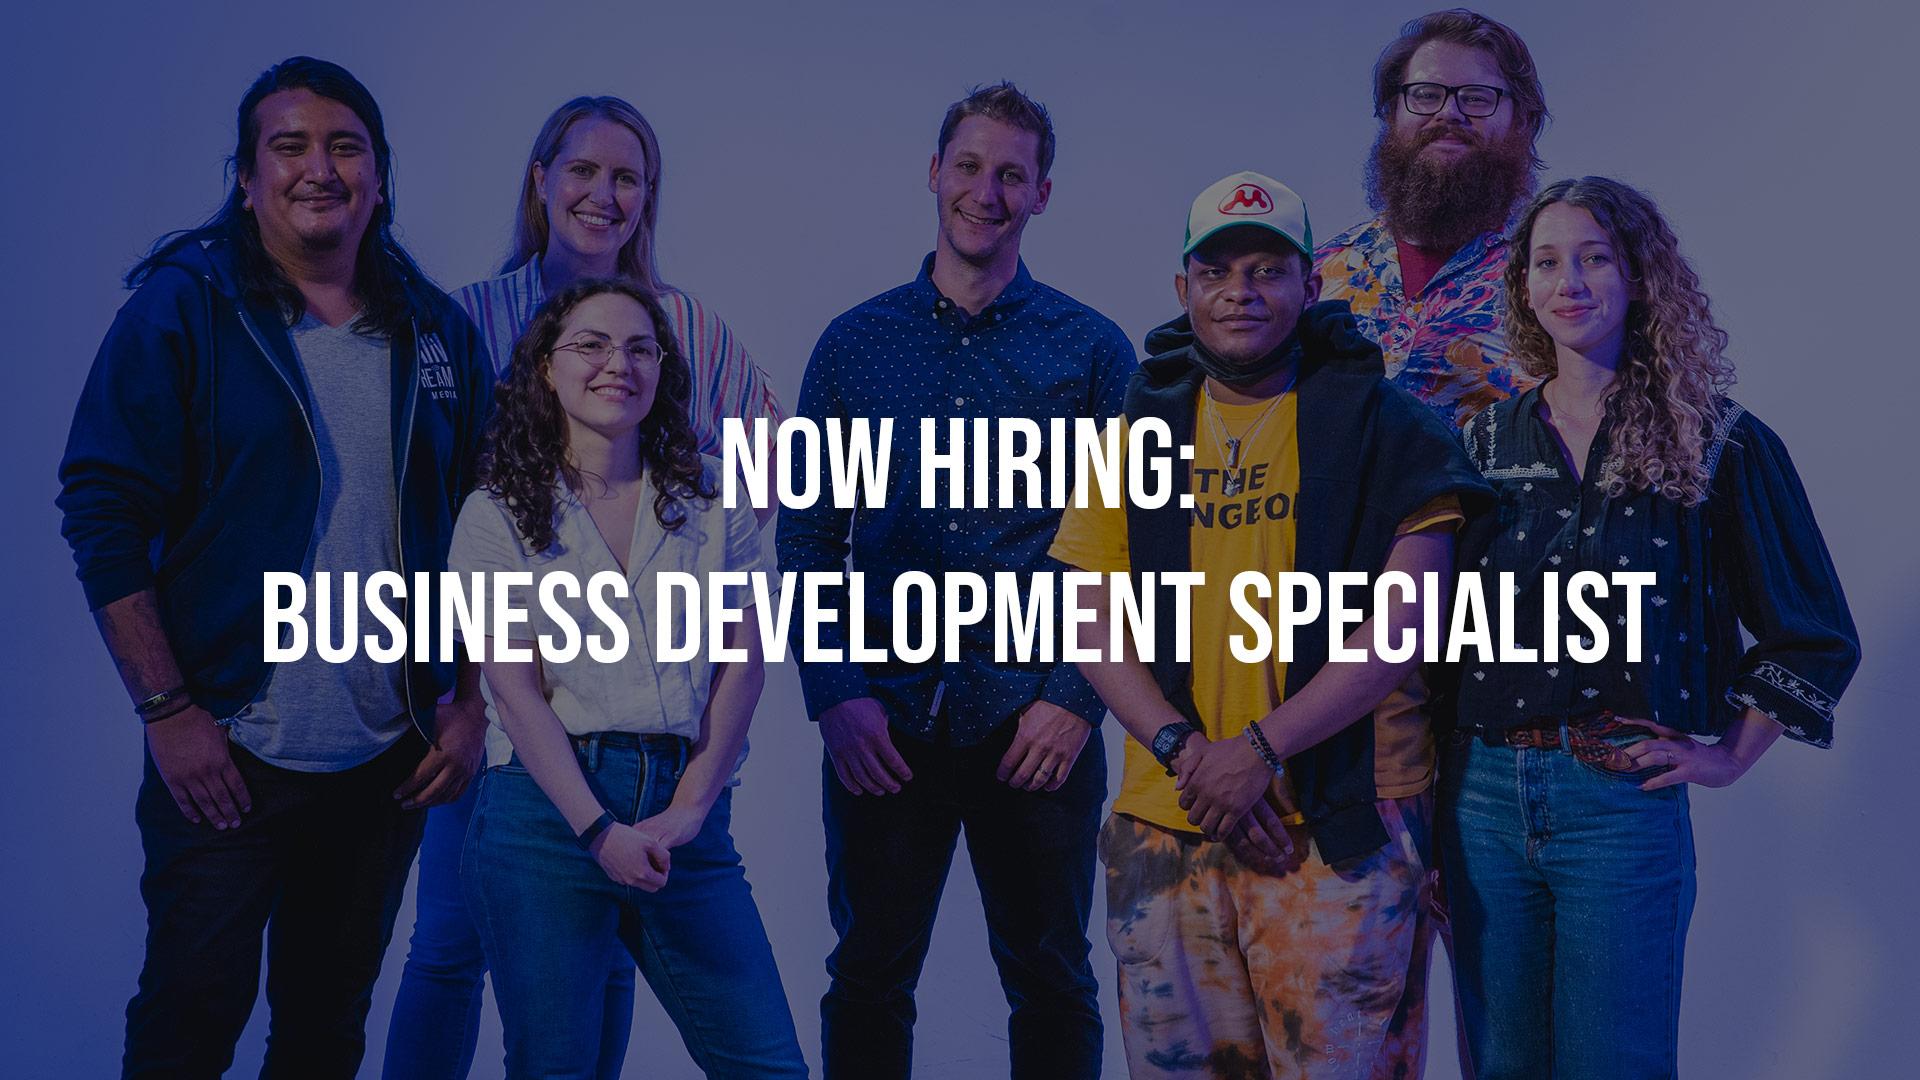 Hiring: Business Development Specialist